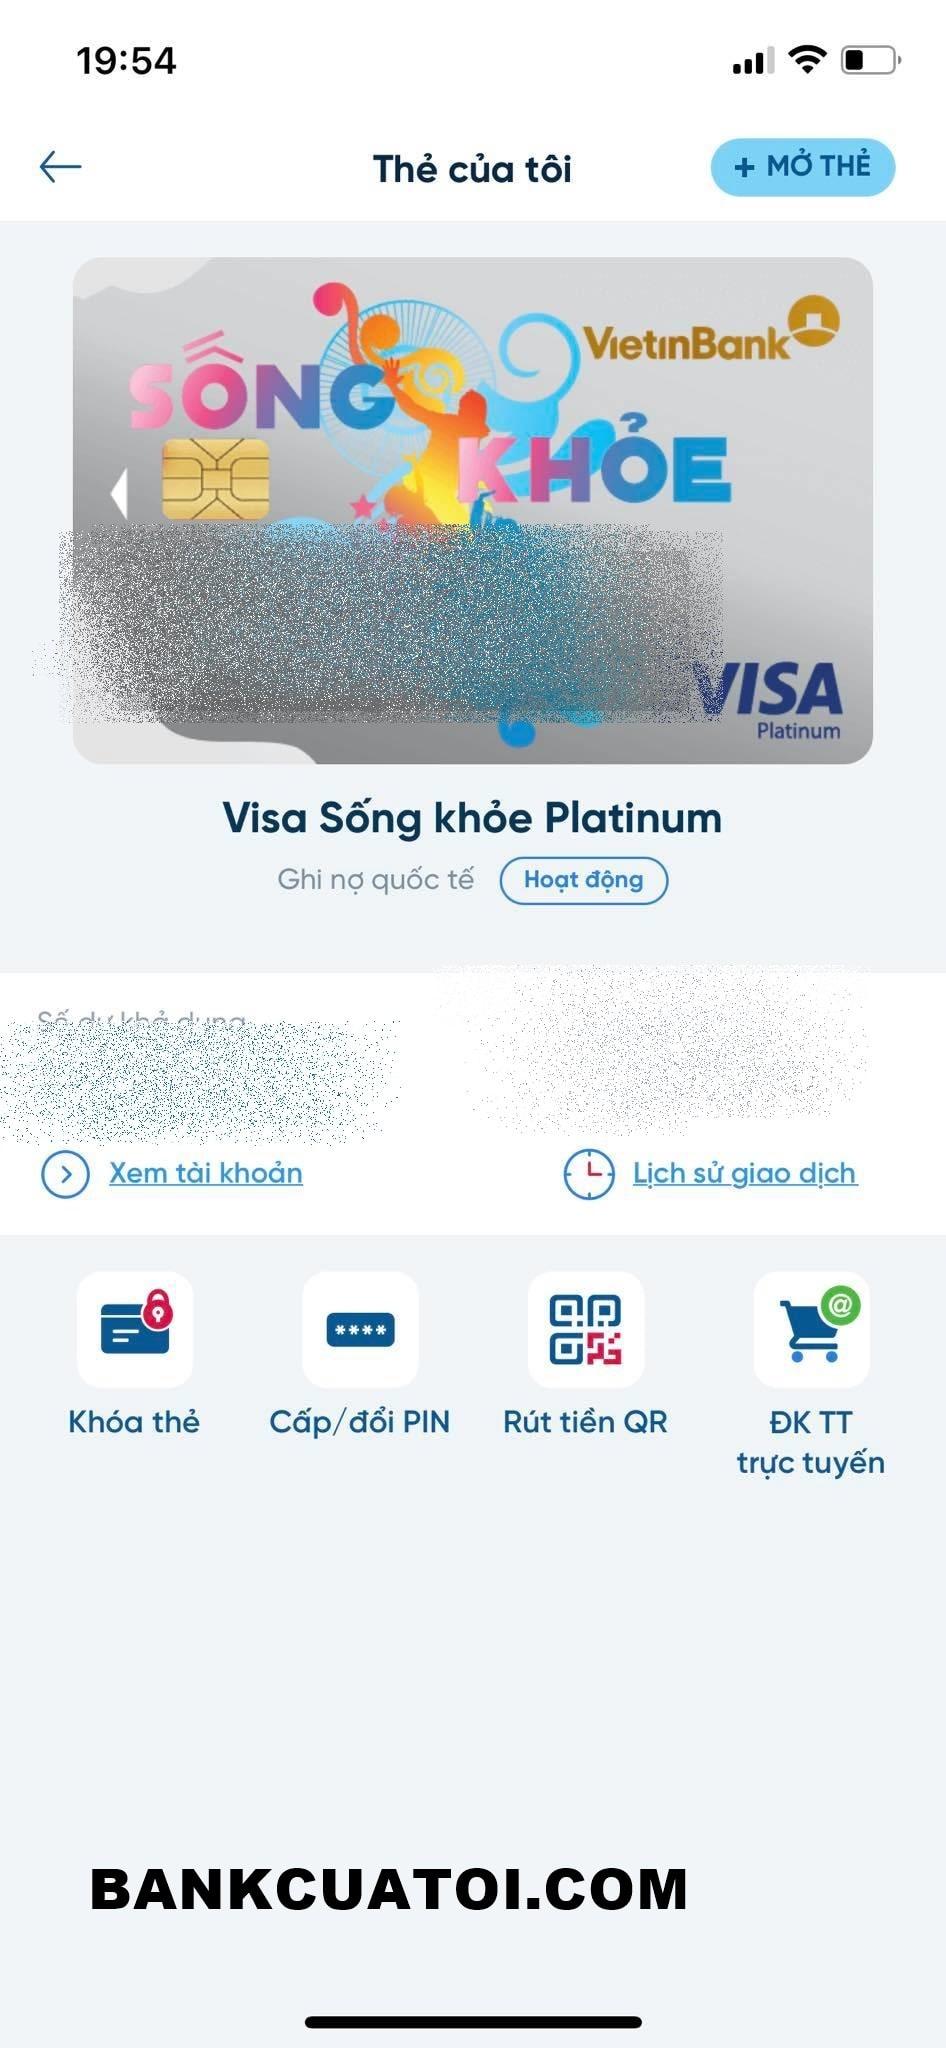 Hủy thẻ atm vietinbank